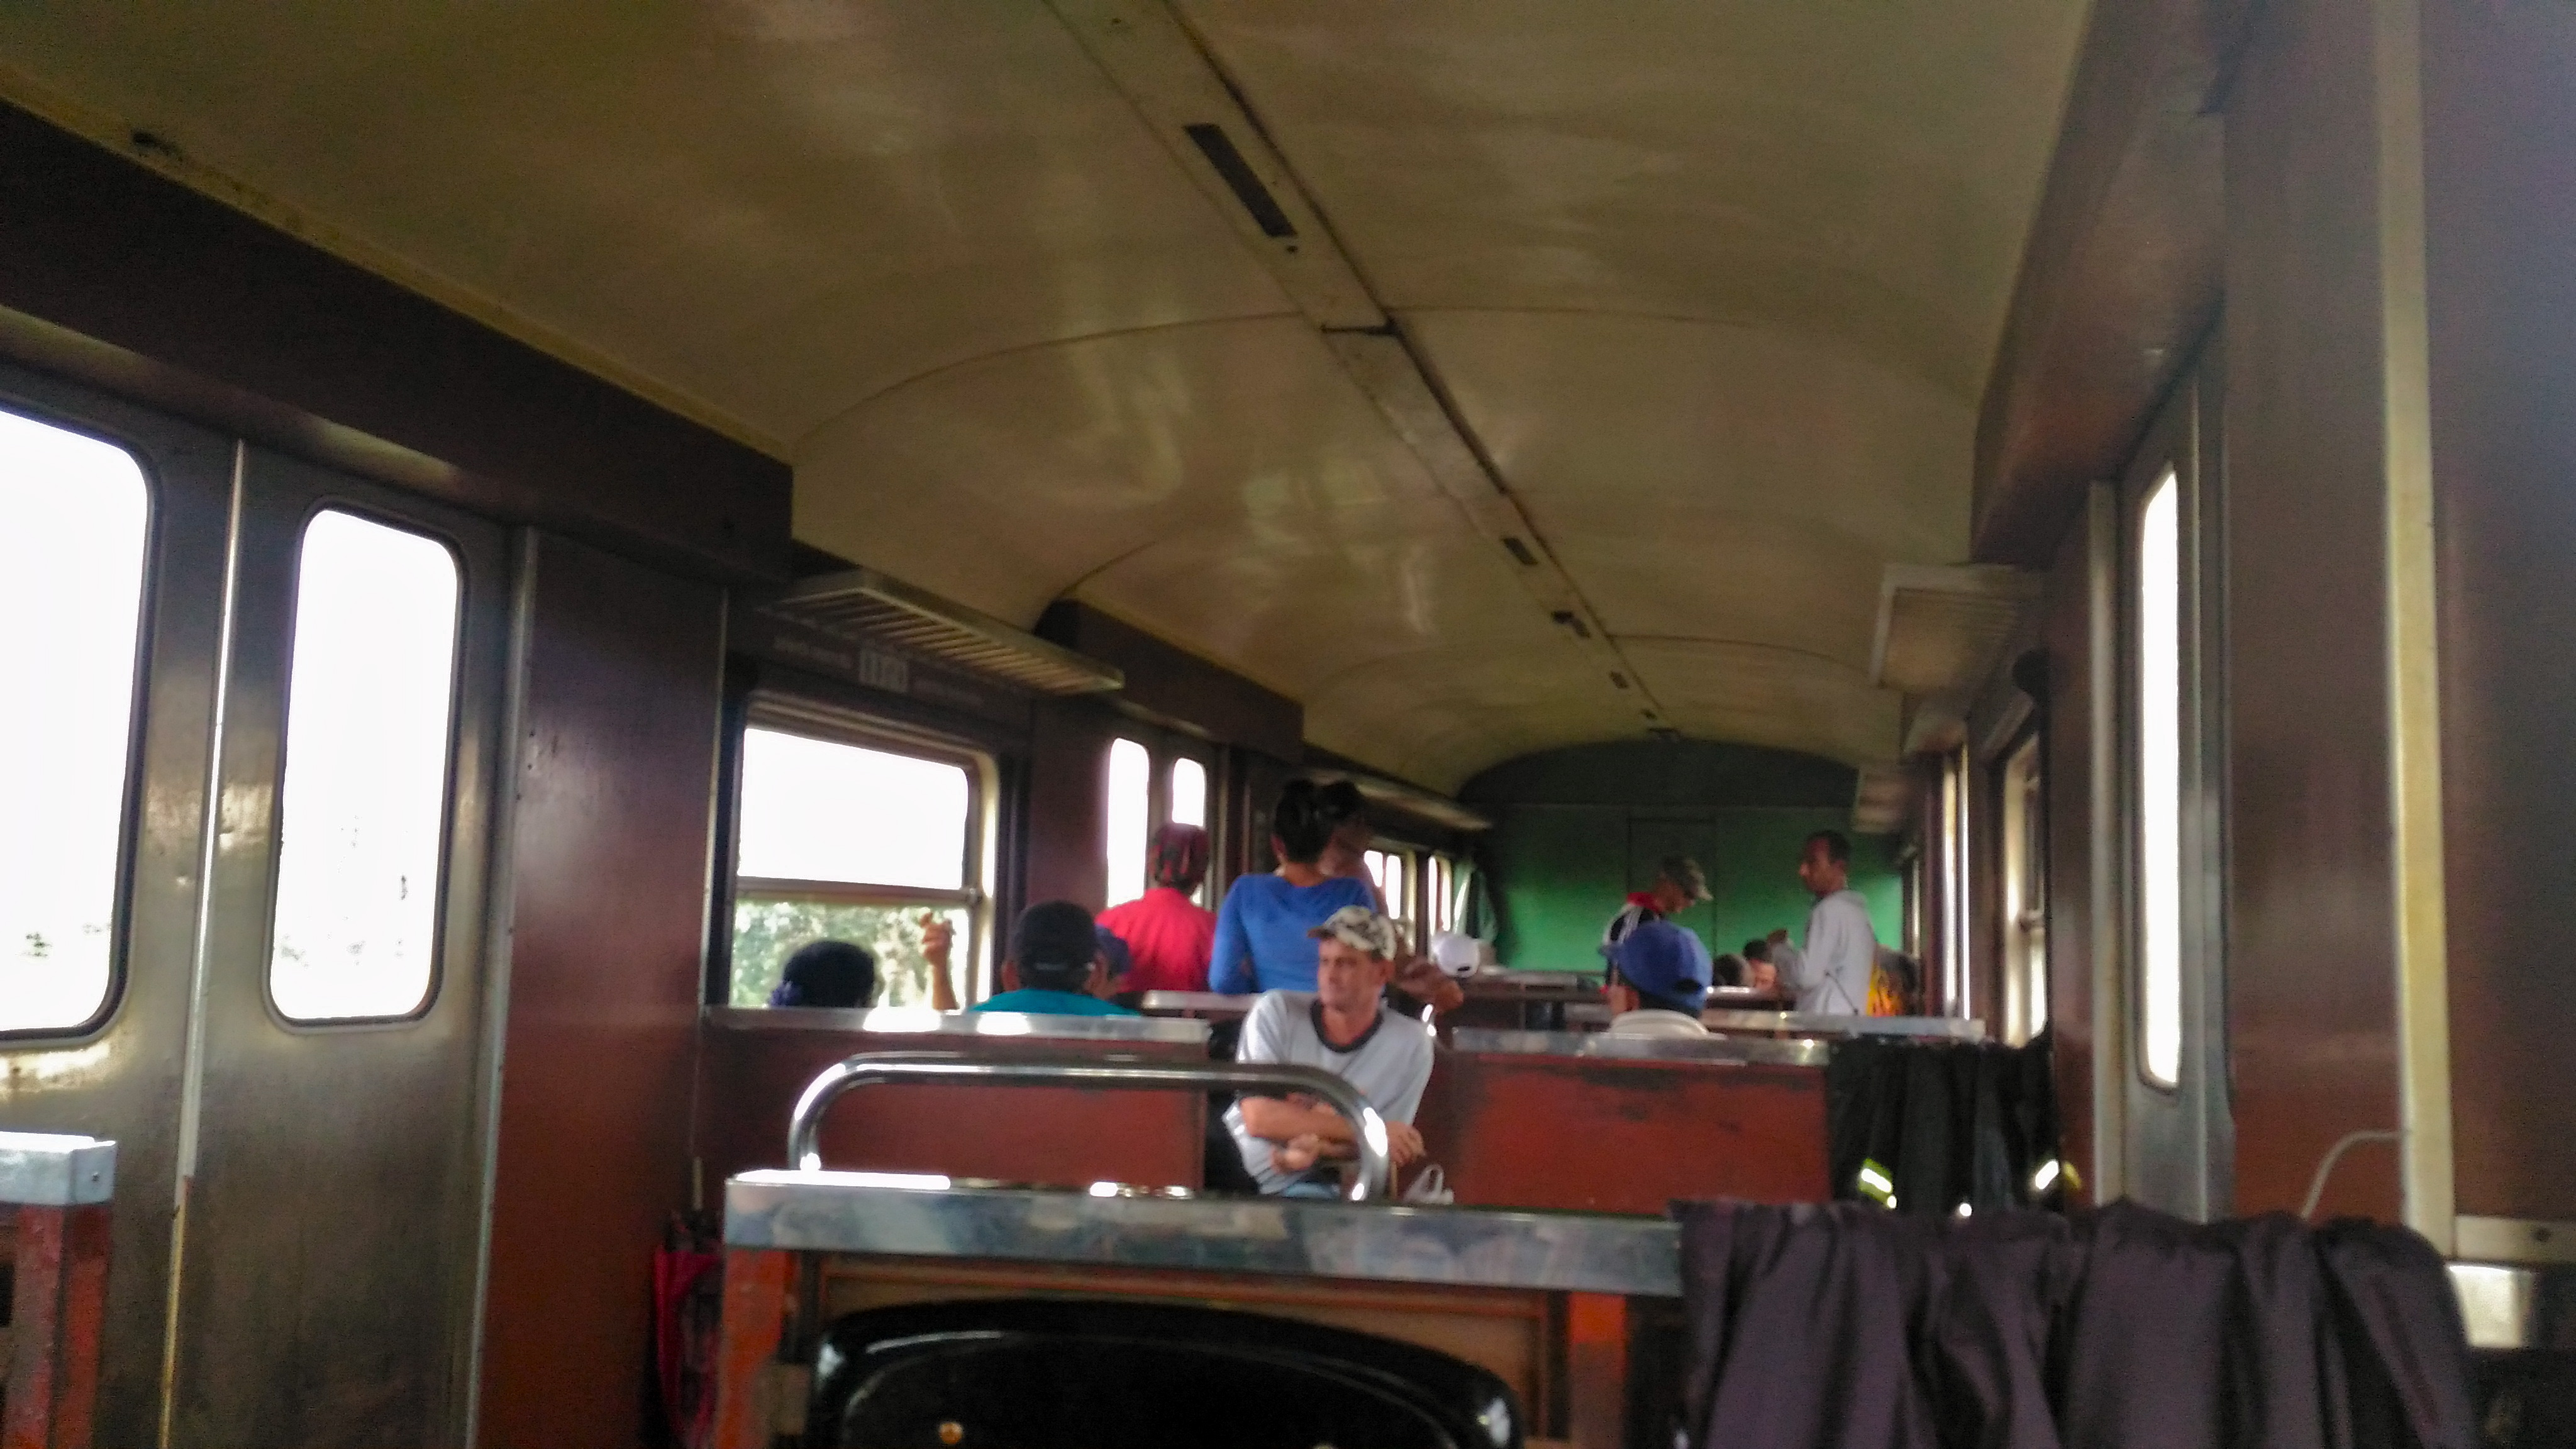 Hershey Train in cuba riding trains in cuba unique transportation in cuba